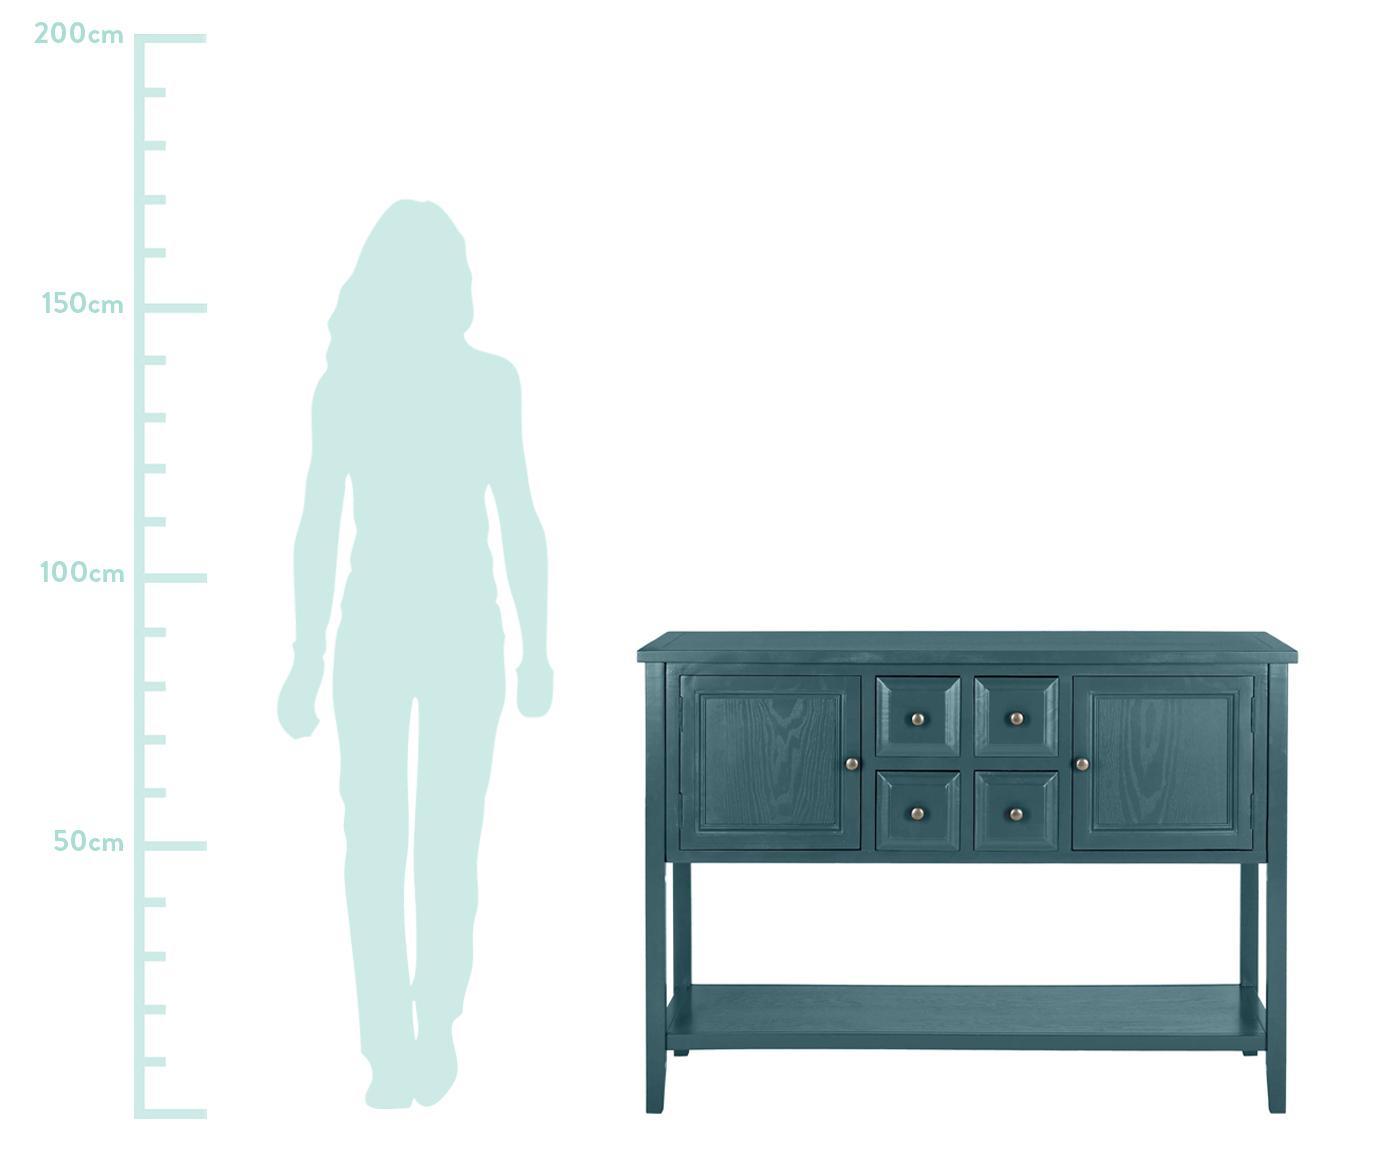 Sideboard Amy im Landhausstil, Korpus: Ulmenholz, Kiefernholz, l, Griffe und Scharniere: Metall, verzinkt, Petrol, 116 x 86 cm